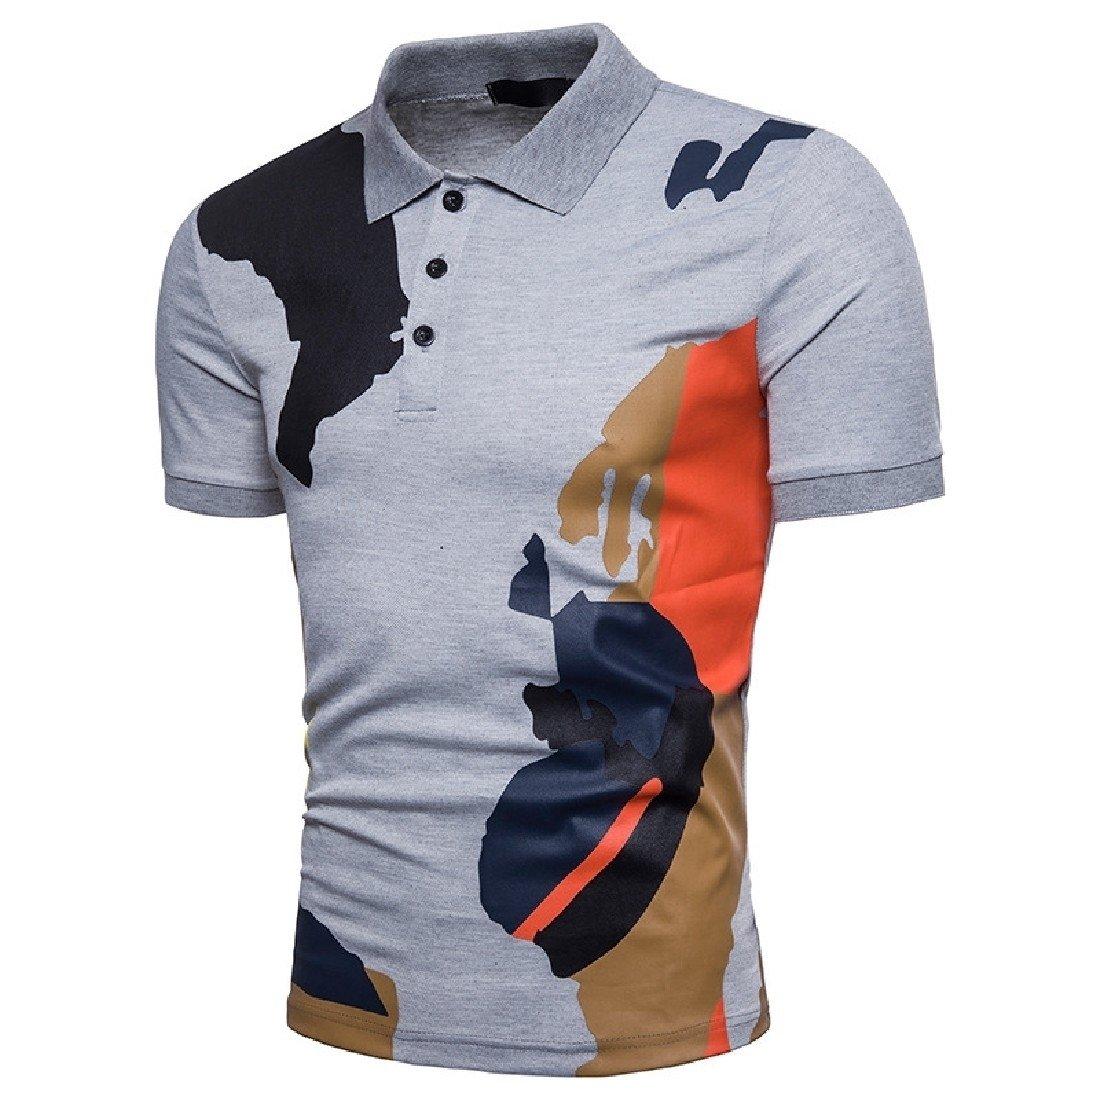 XINHE Men Casual Turndown Collar Short Sleeve Loose Hit Color Polo Shirt